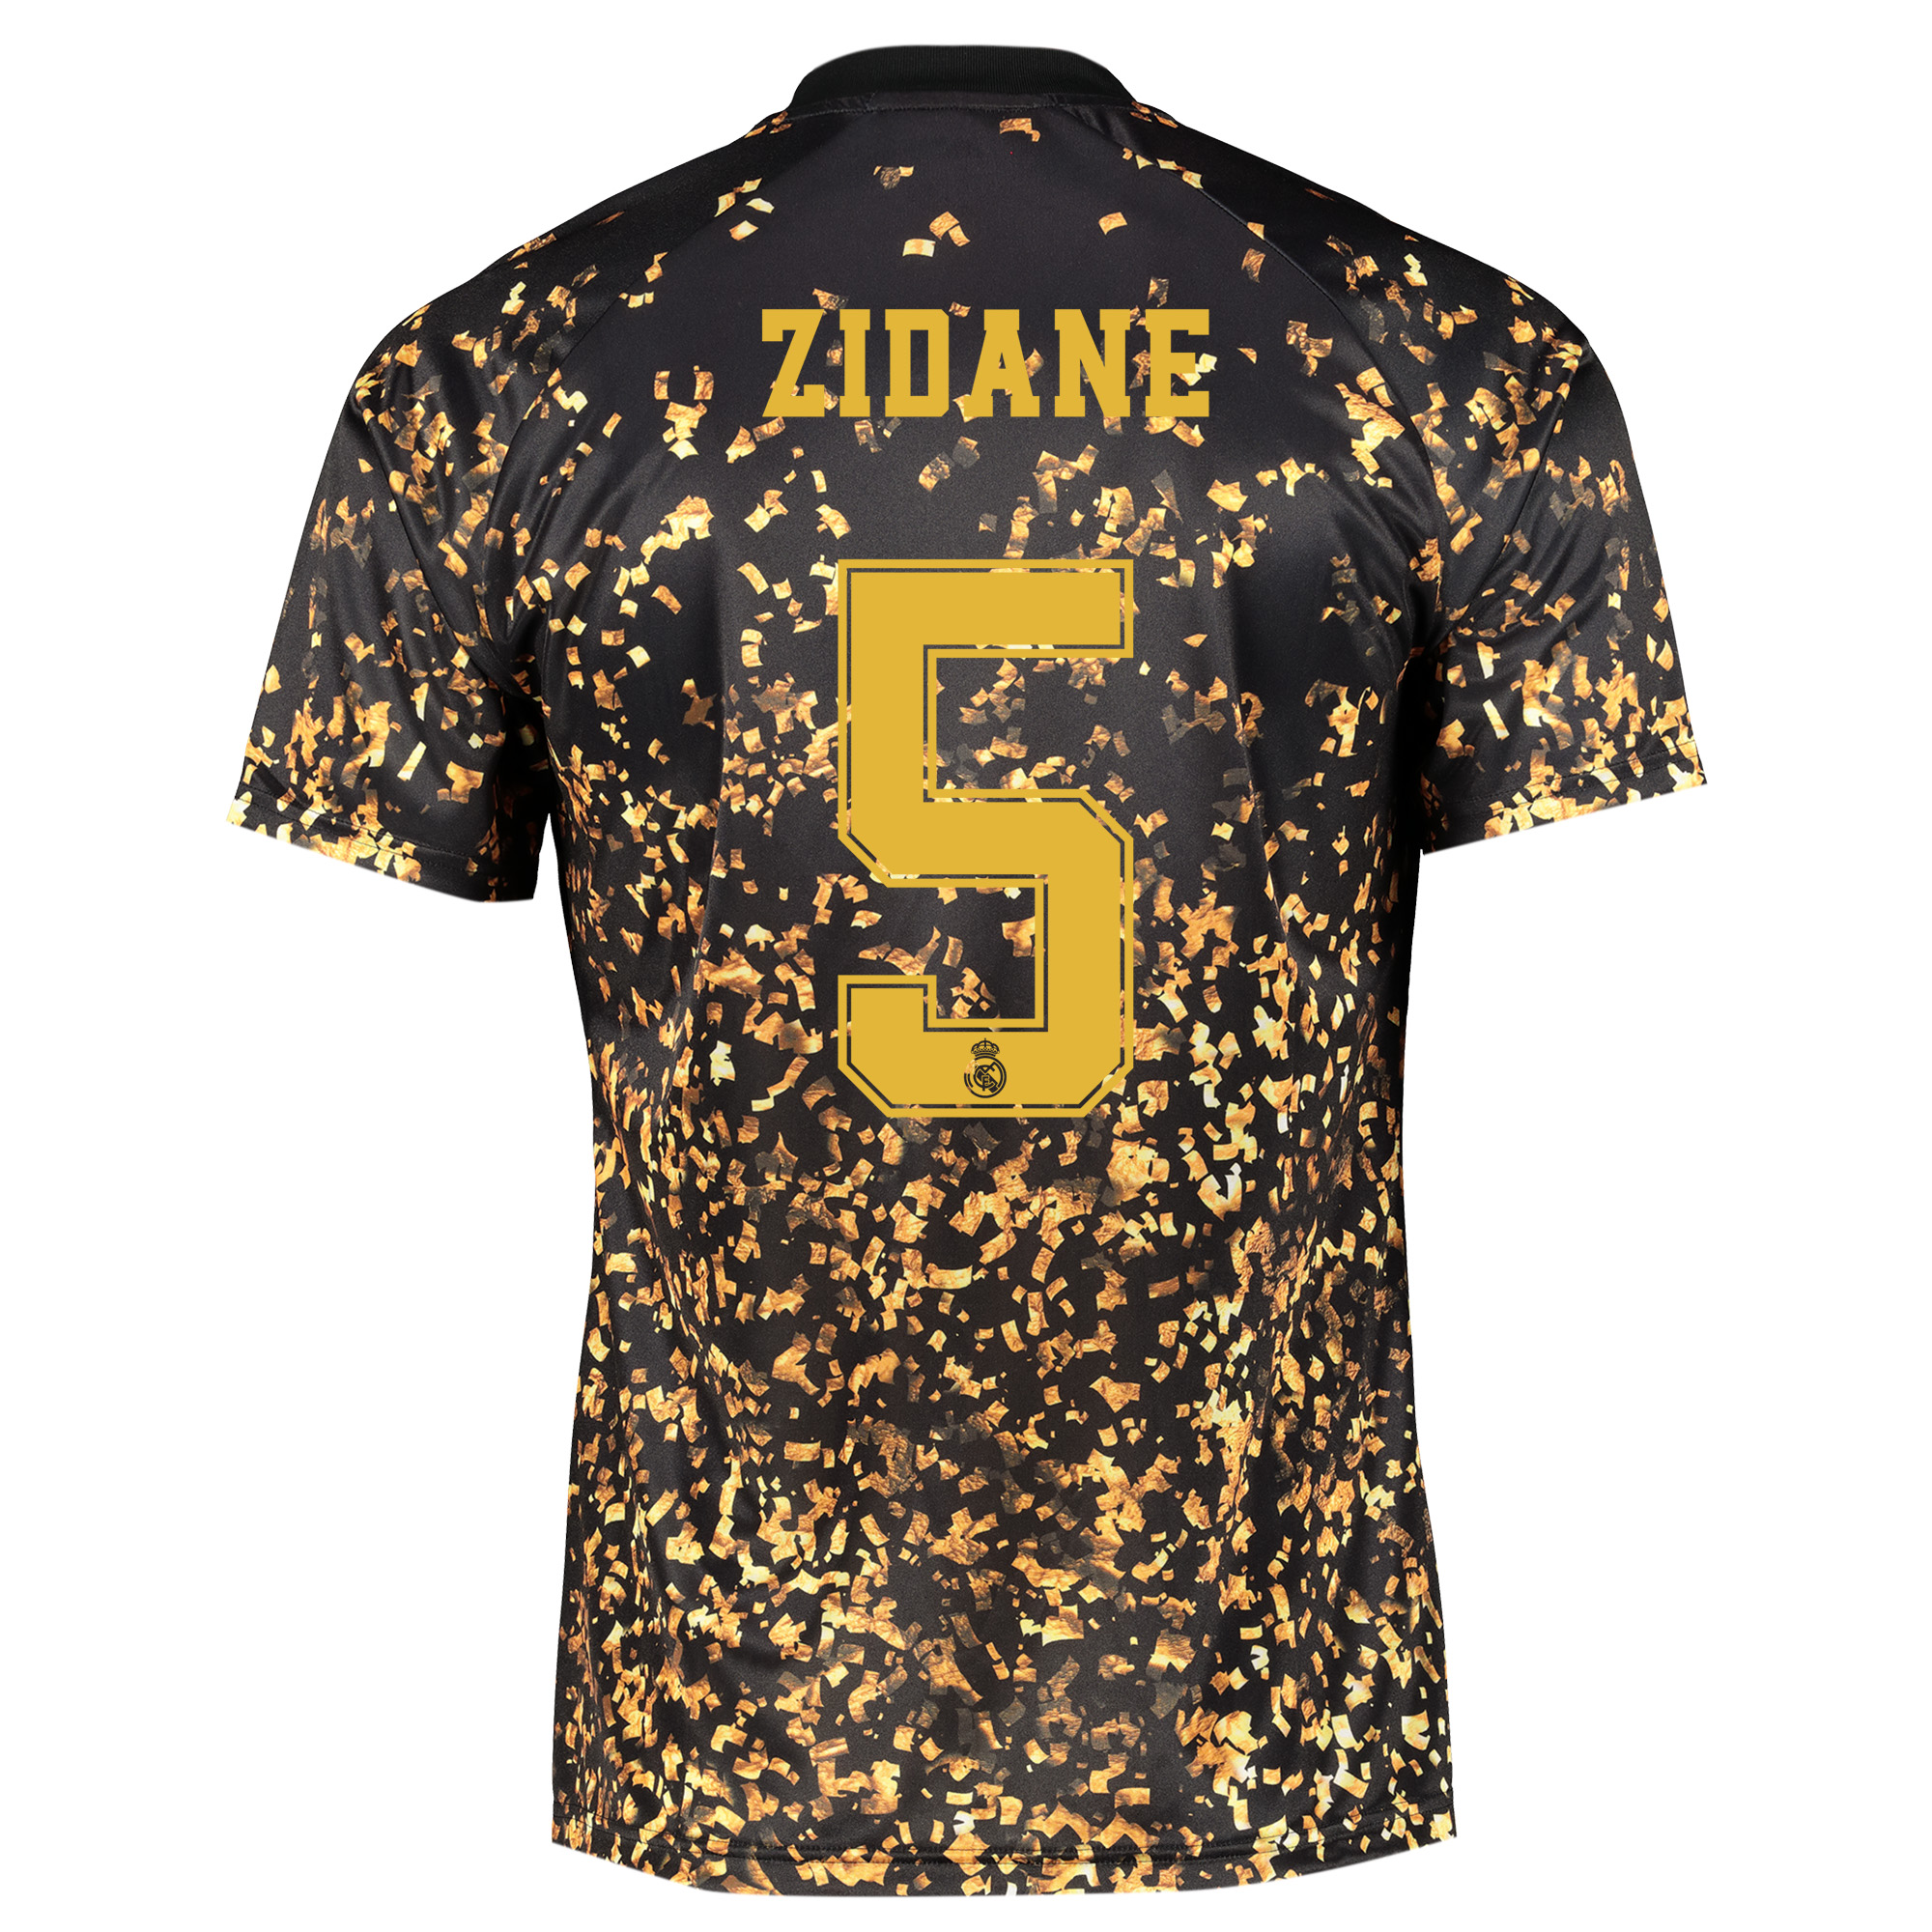 Camiseta adidas EA Sports del Real Madrid - Negro dorsal Zidane  5